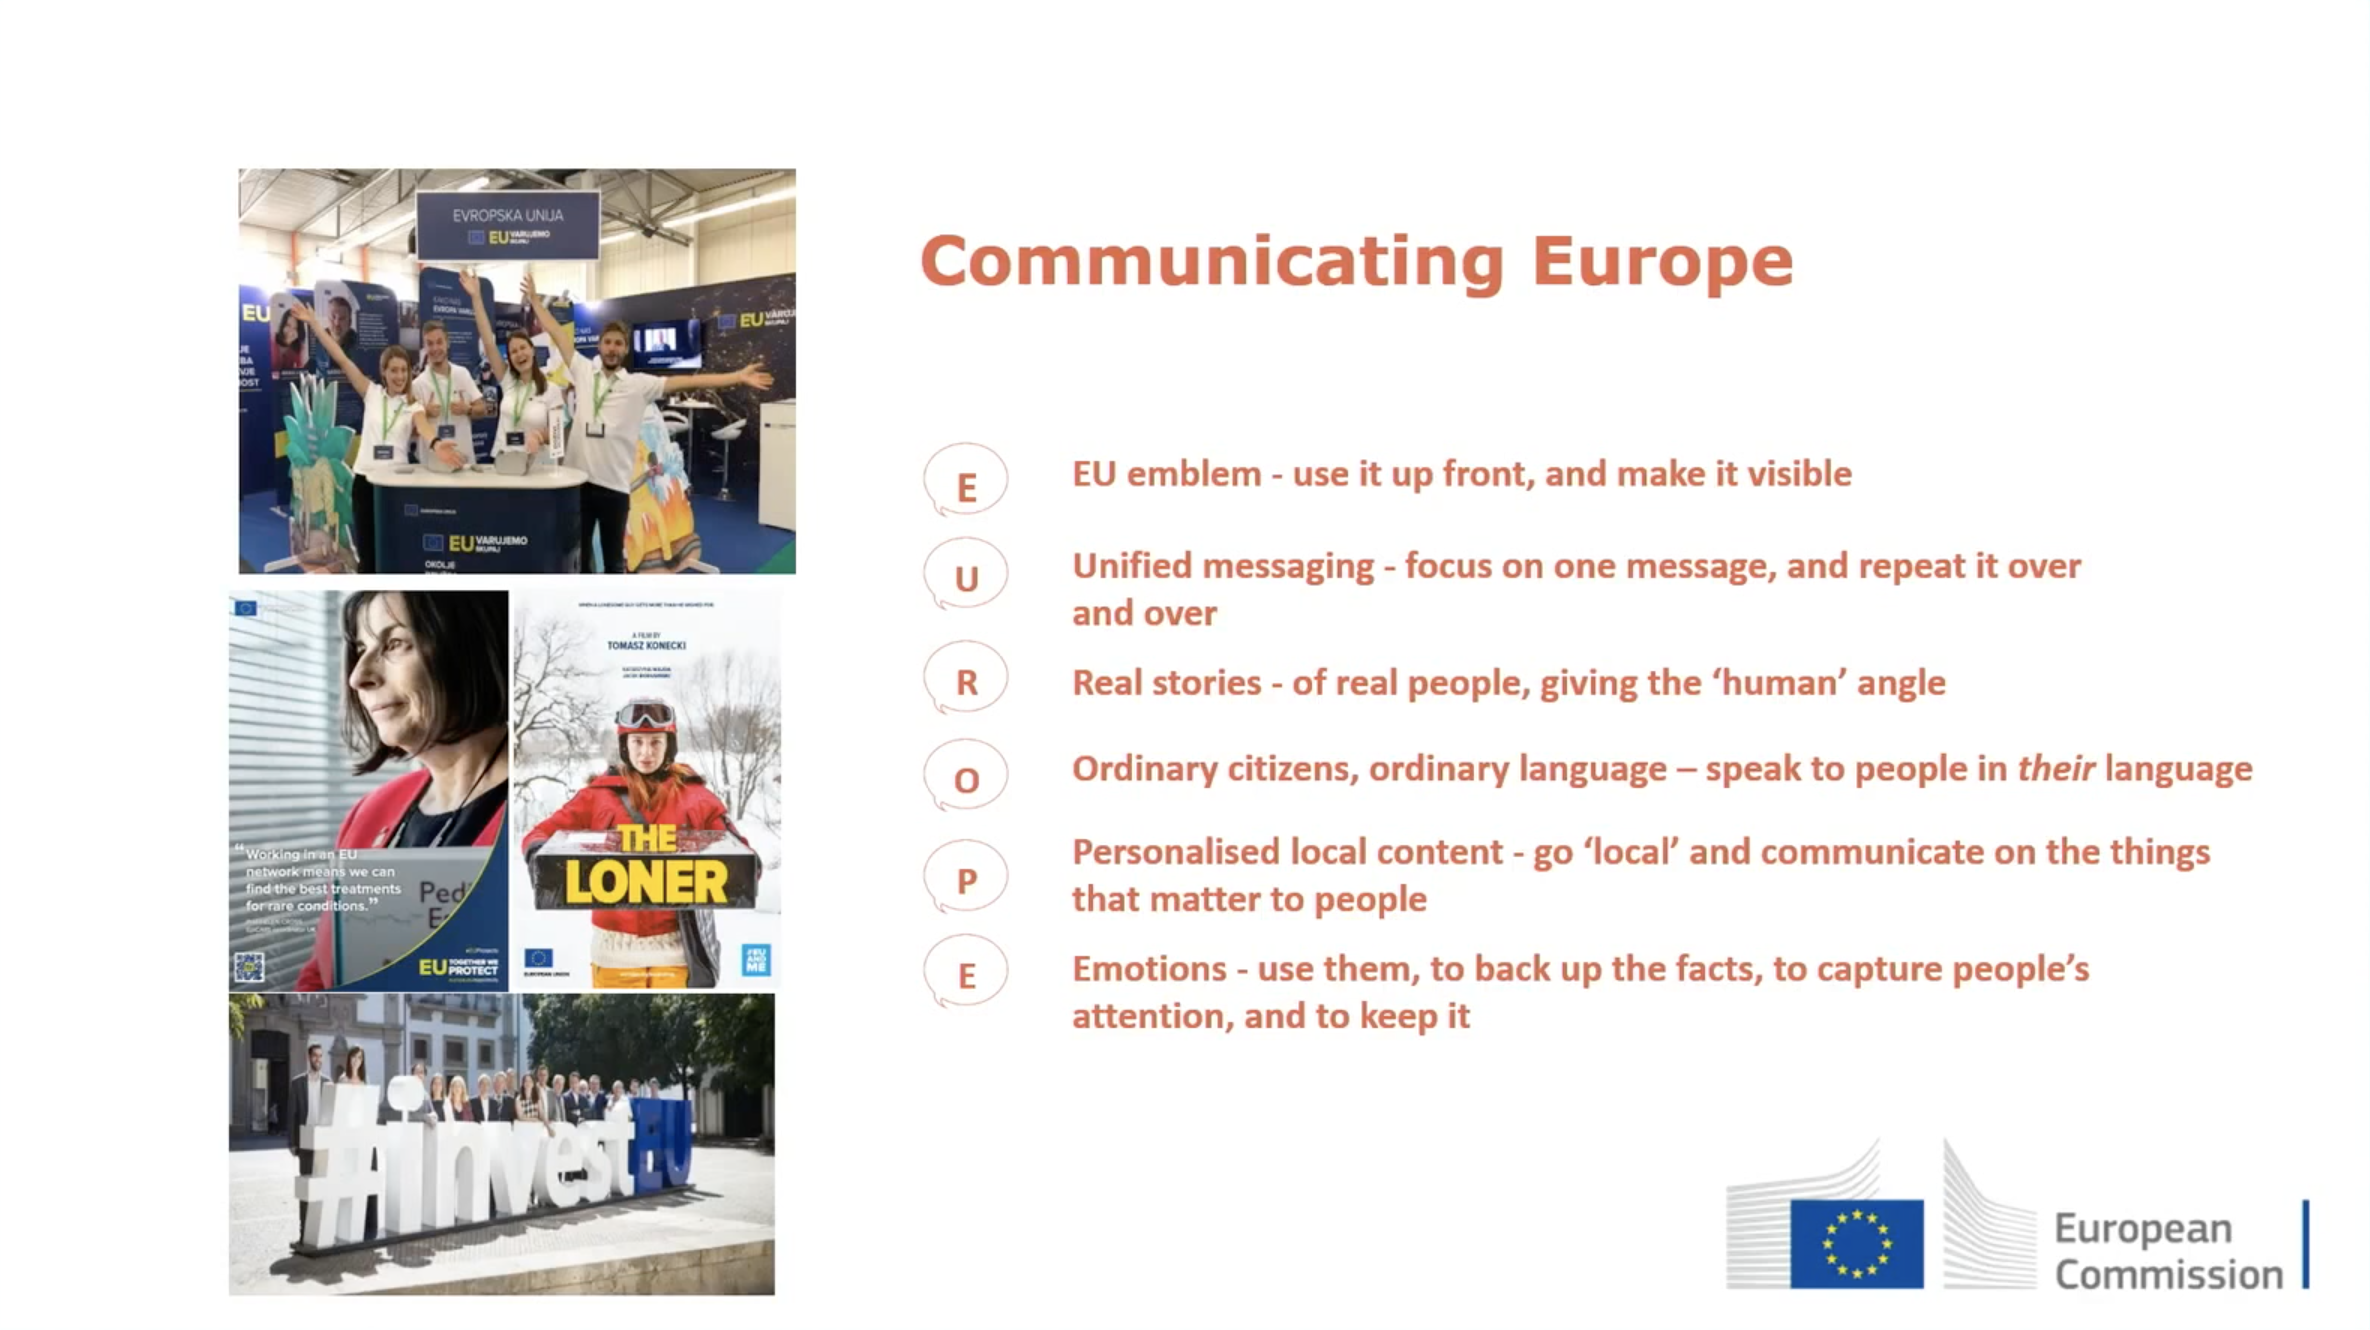 comm_europe_europcom_2019